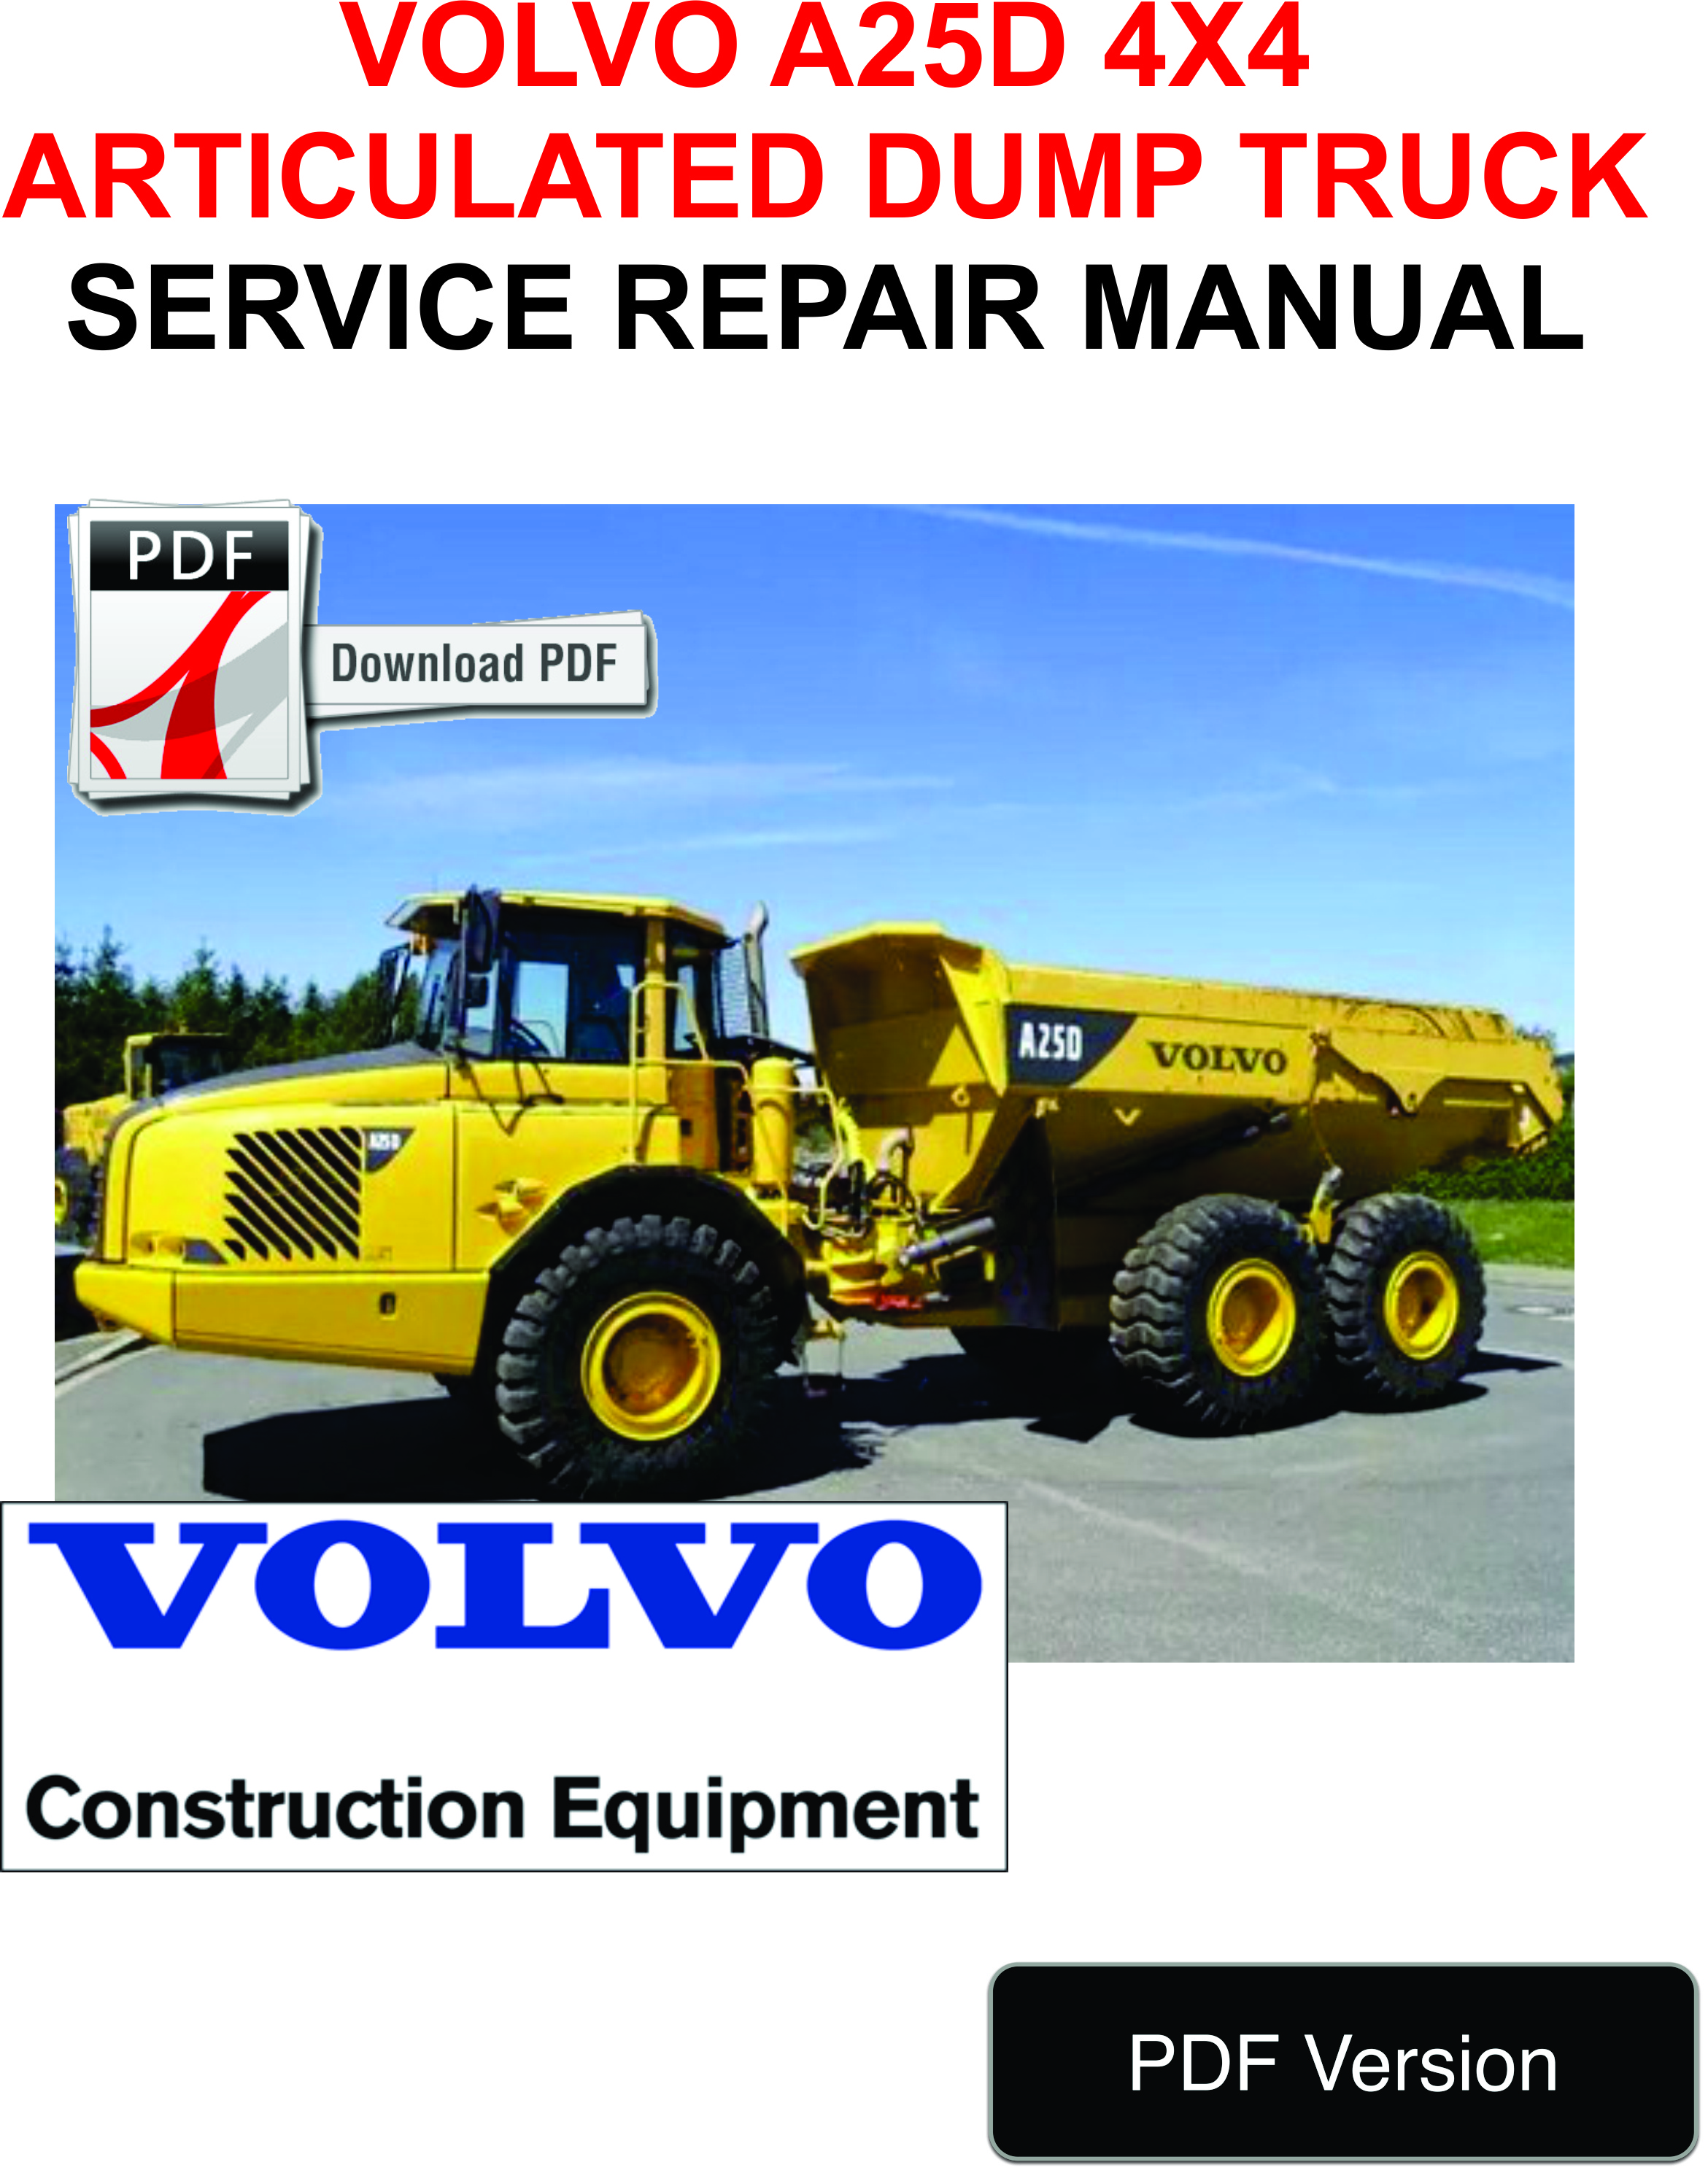 Volvo A25 Wiring Schematic Part Diagrams A25c Diagram A25d 4x4 Articulated Dump Truck Full Service Repair Manual At